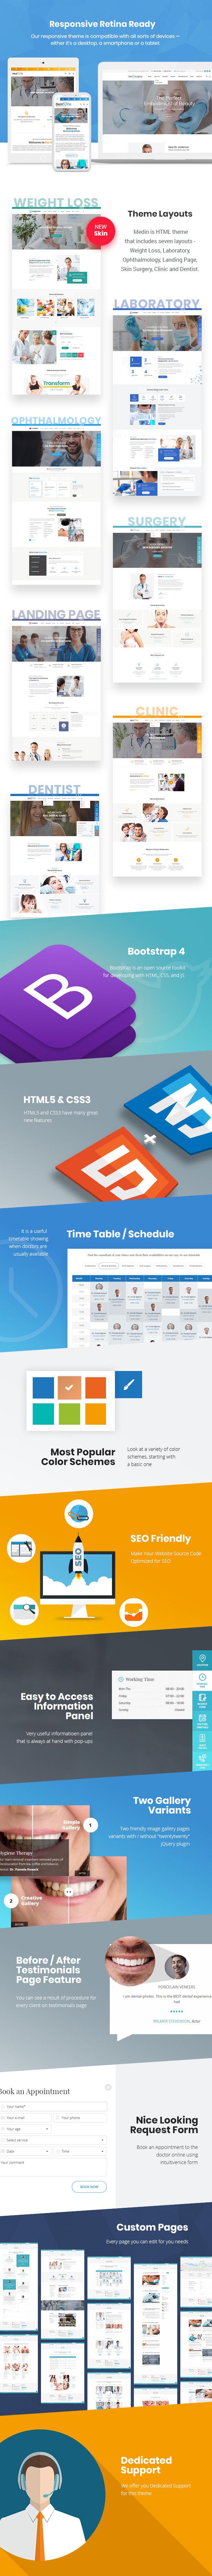 Medin - Medical Clinic HTML Template - 2